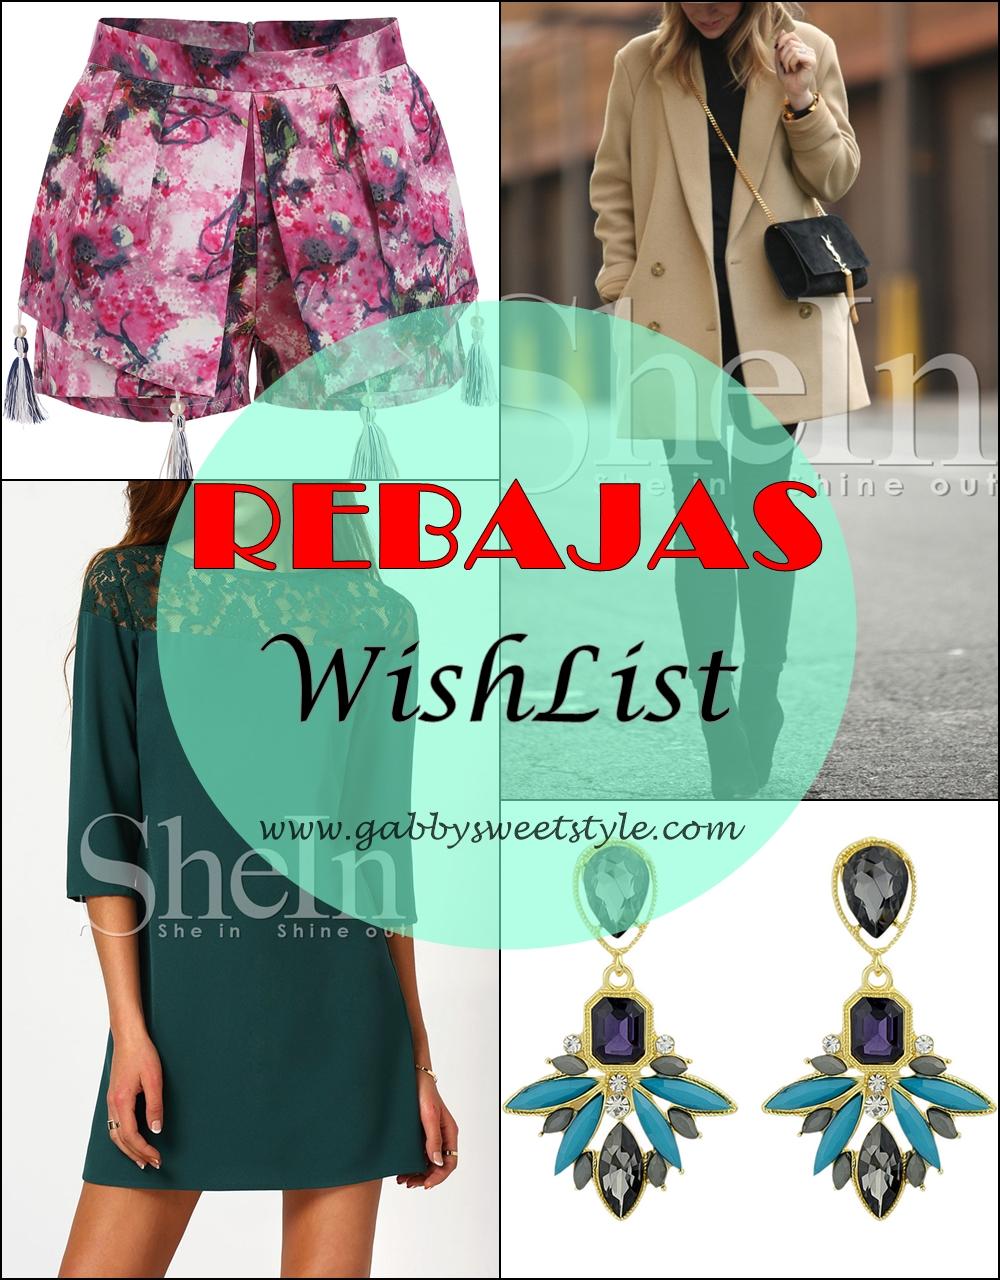 REBAJAS (WishList)